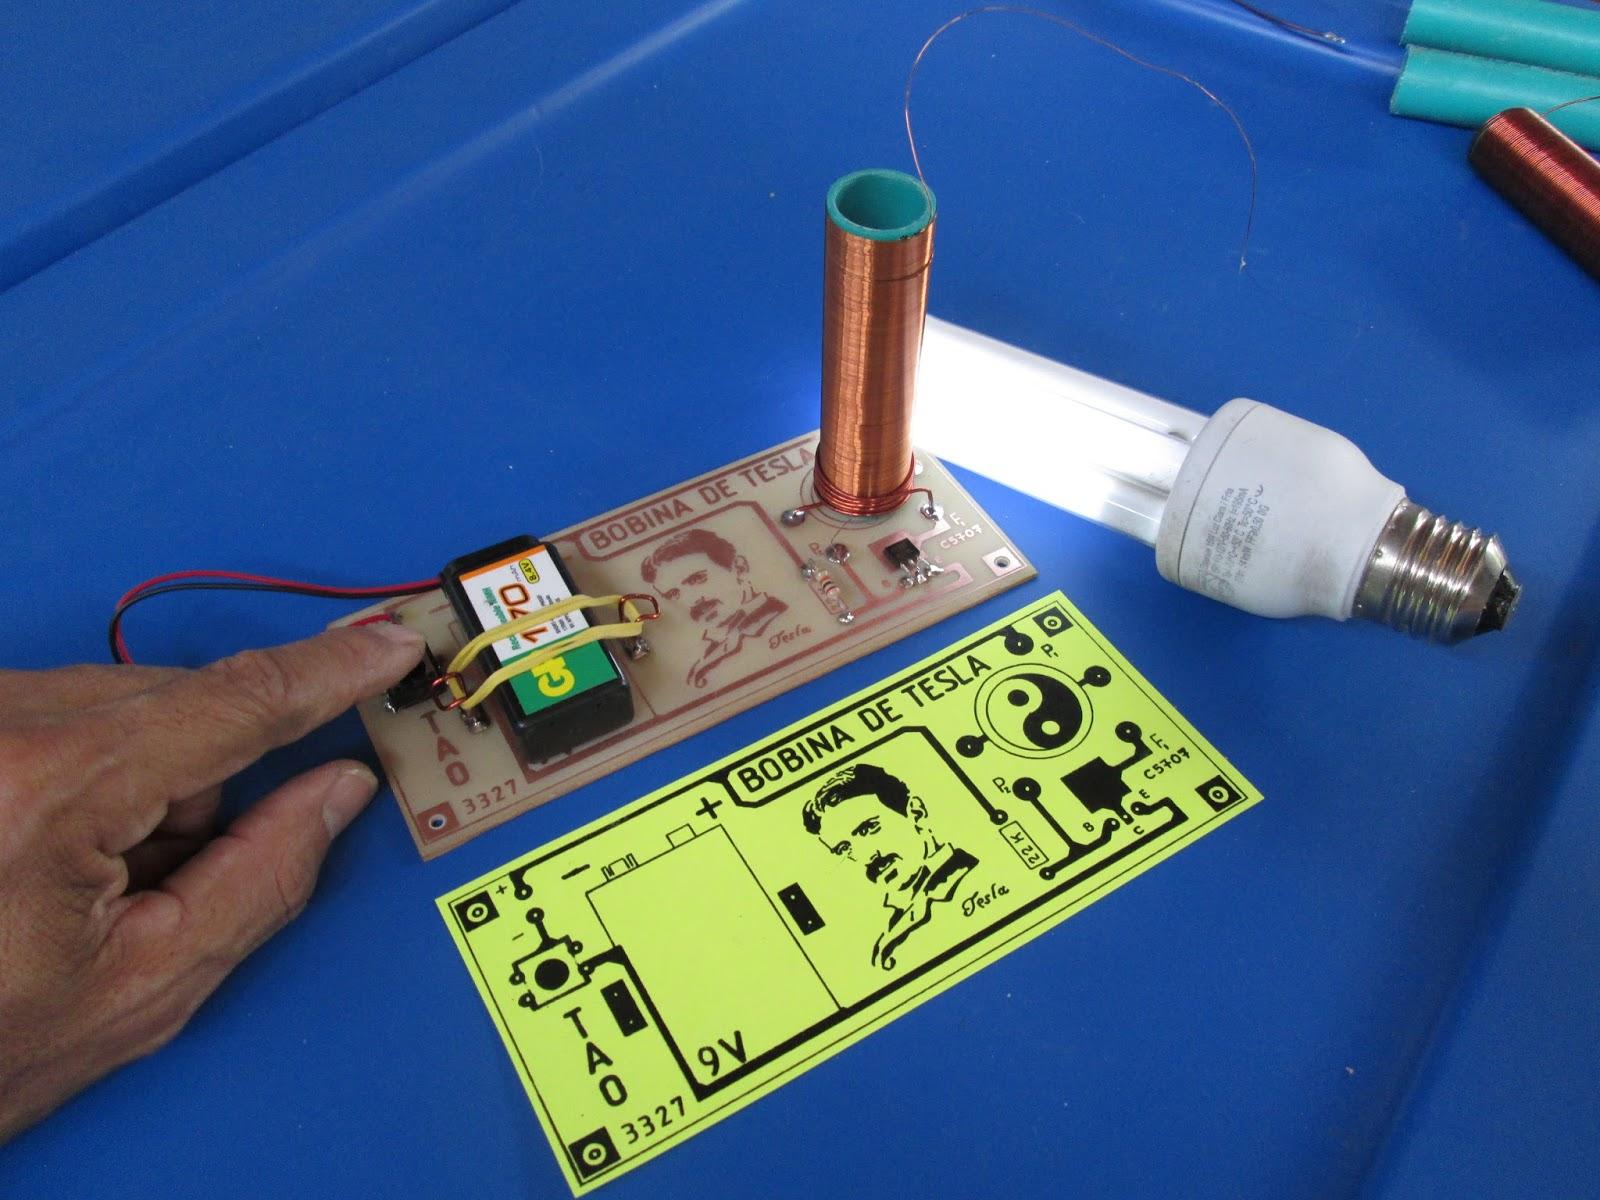 Circuito Bobina De Tesla : Impresos electrÓnicos tao bobina de tesla facil v tao